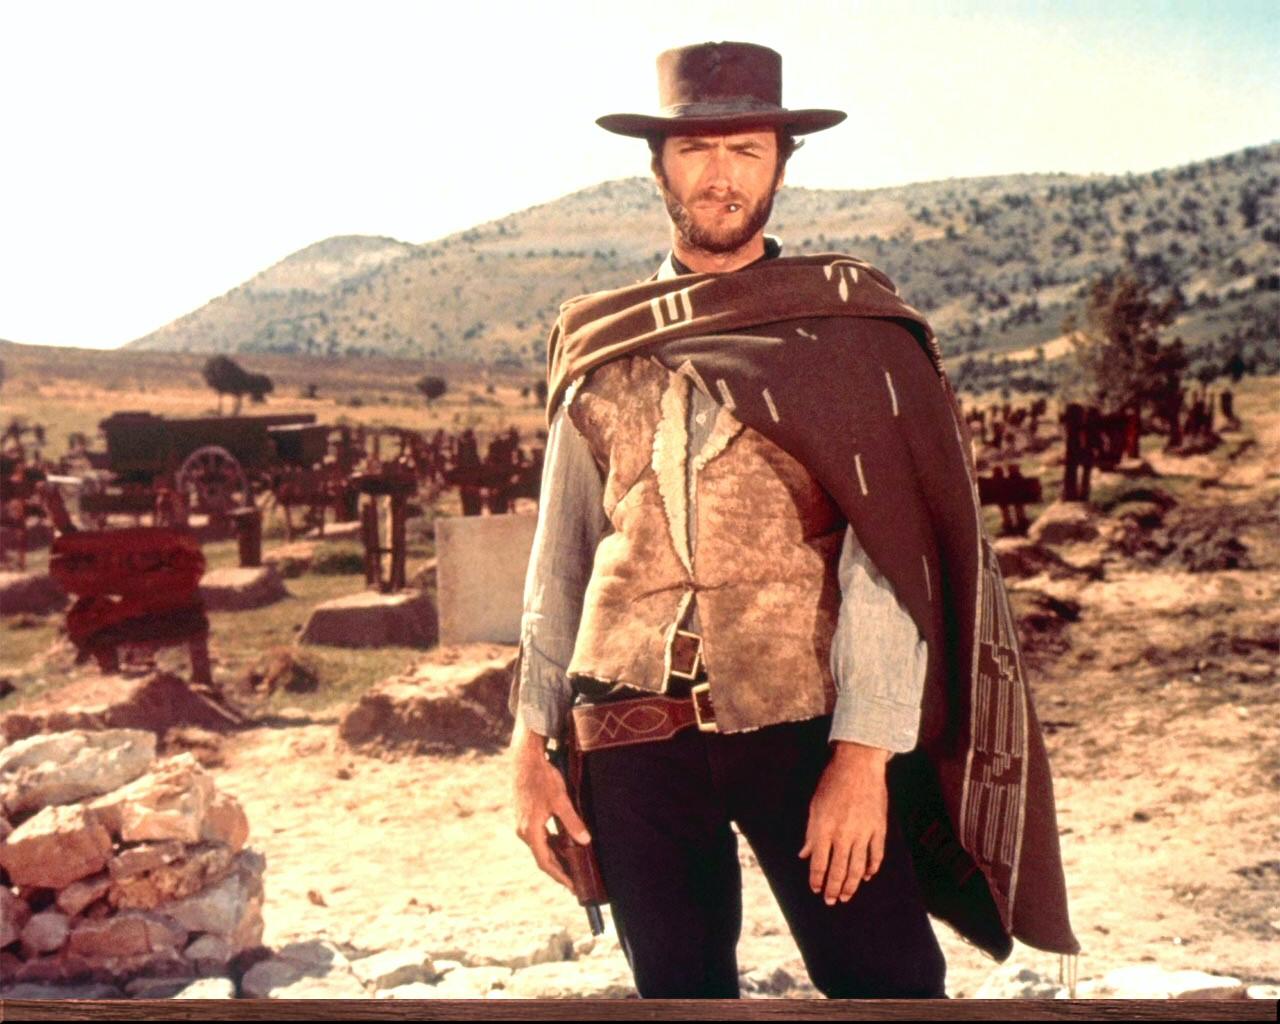 Clint Eastwood Annex